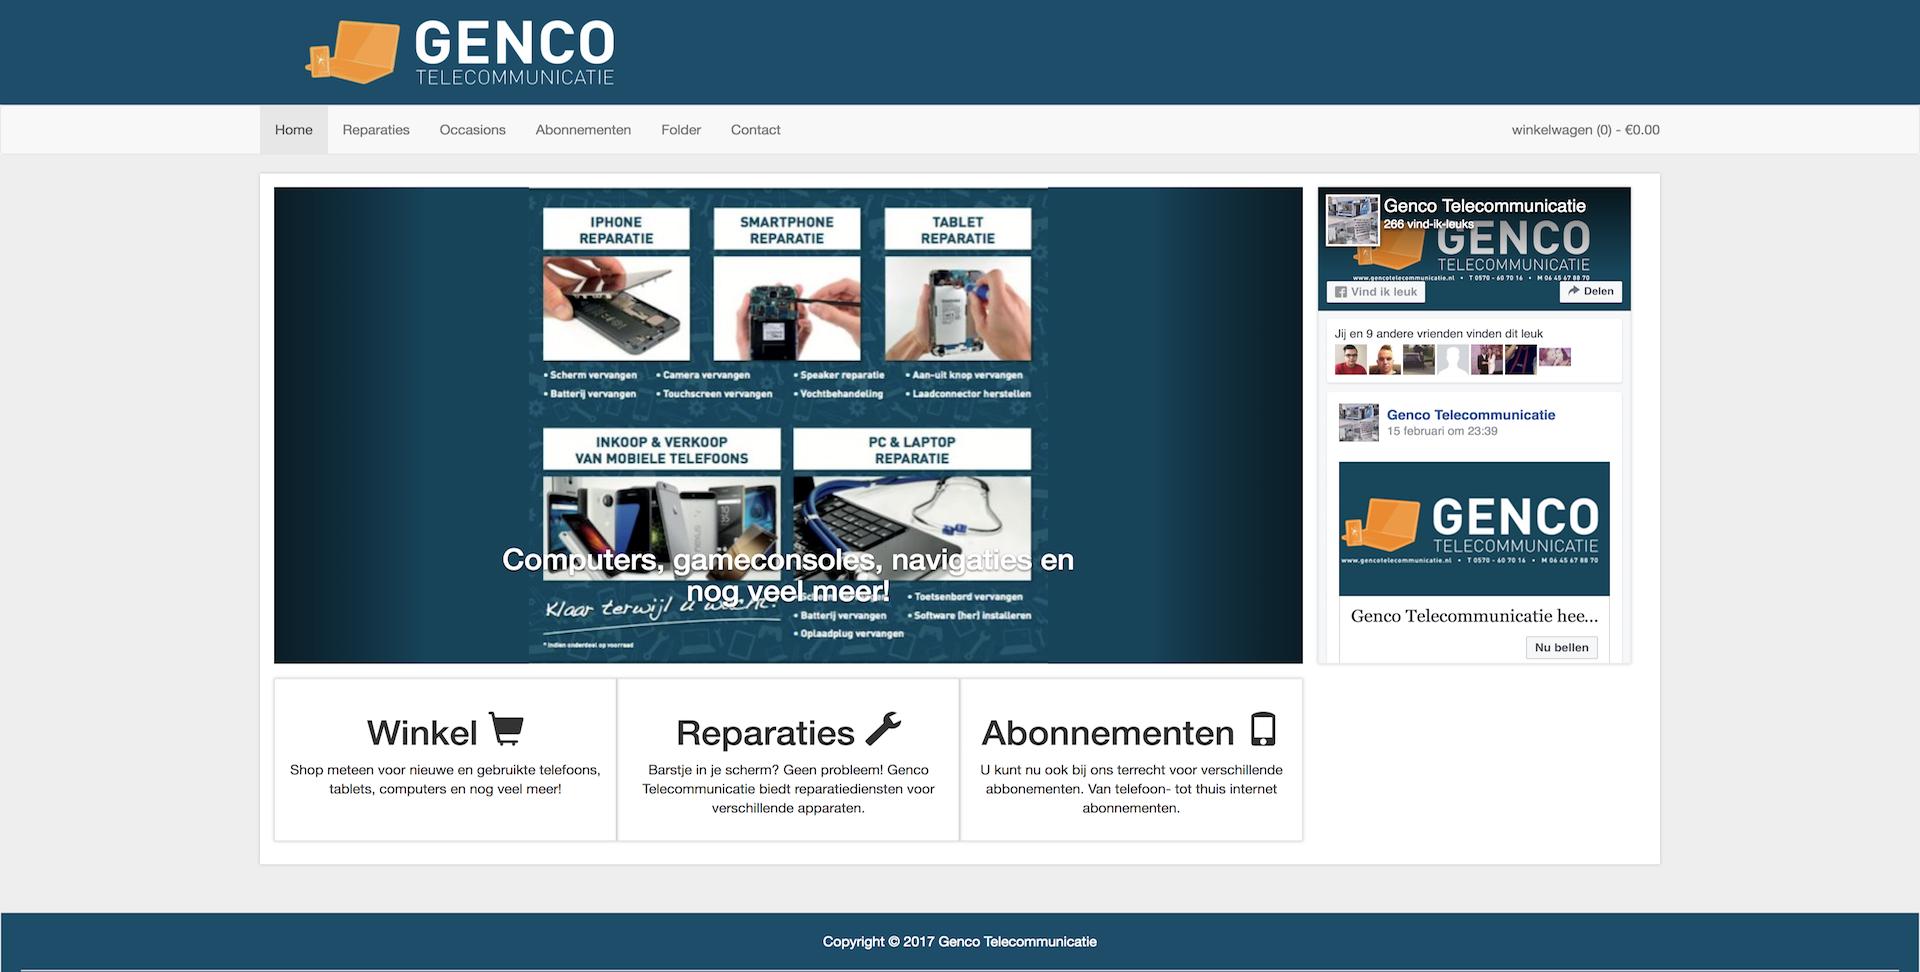 Genco Telecommunicatie